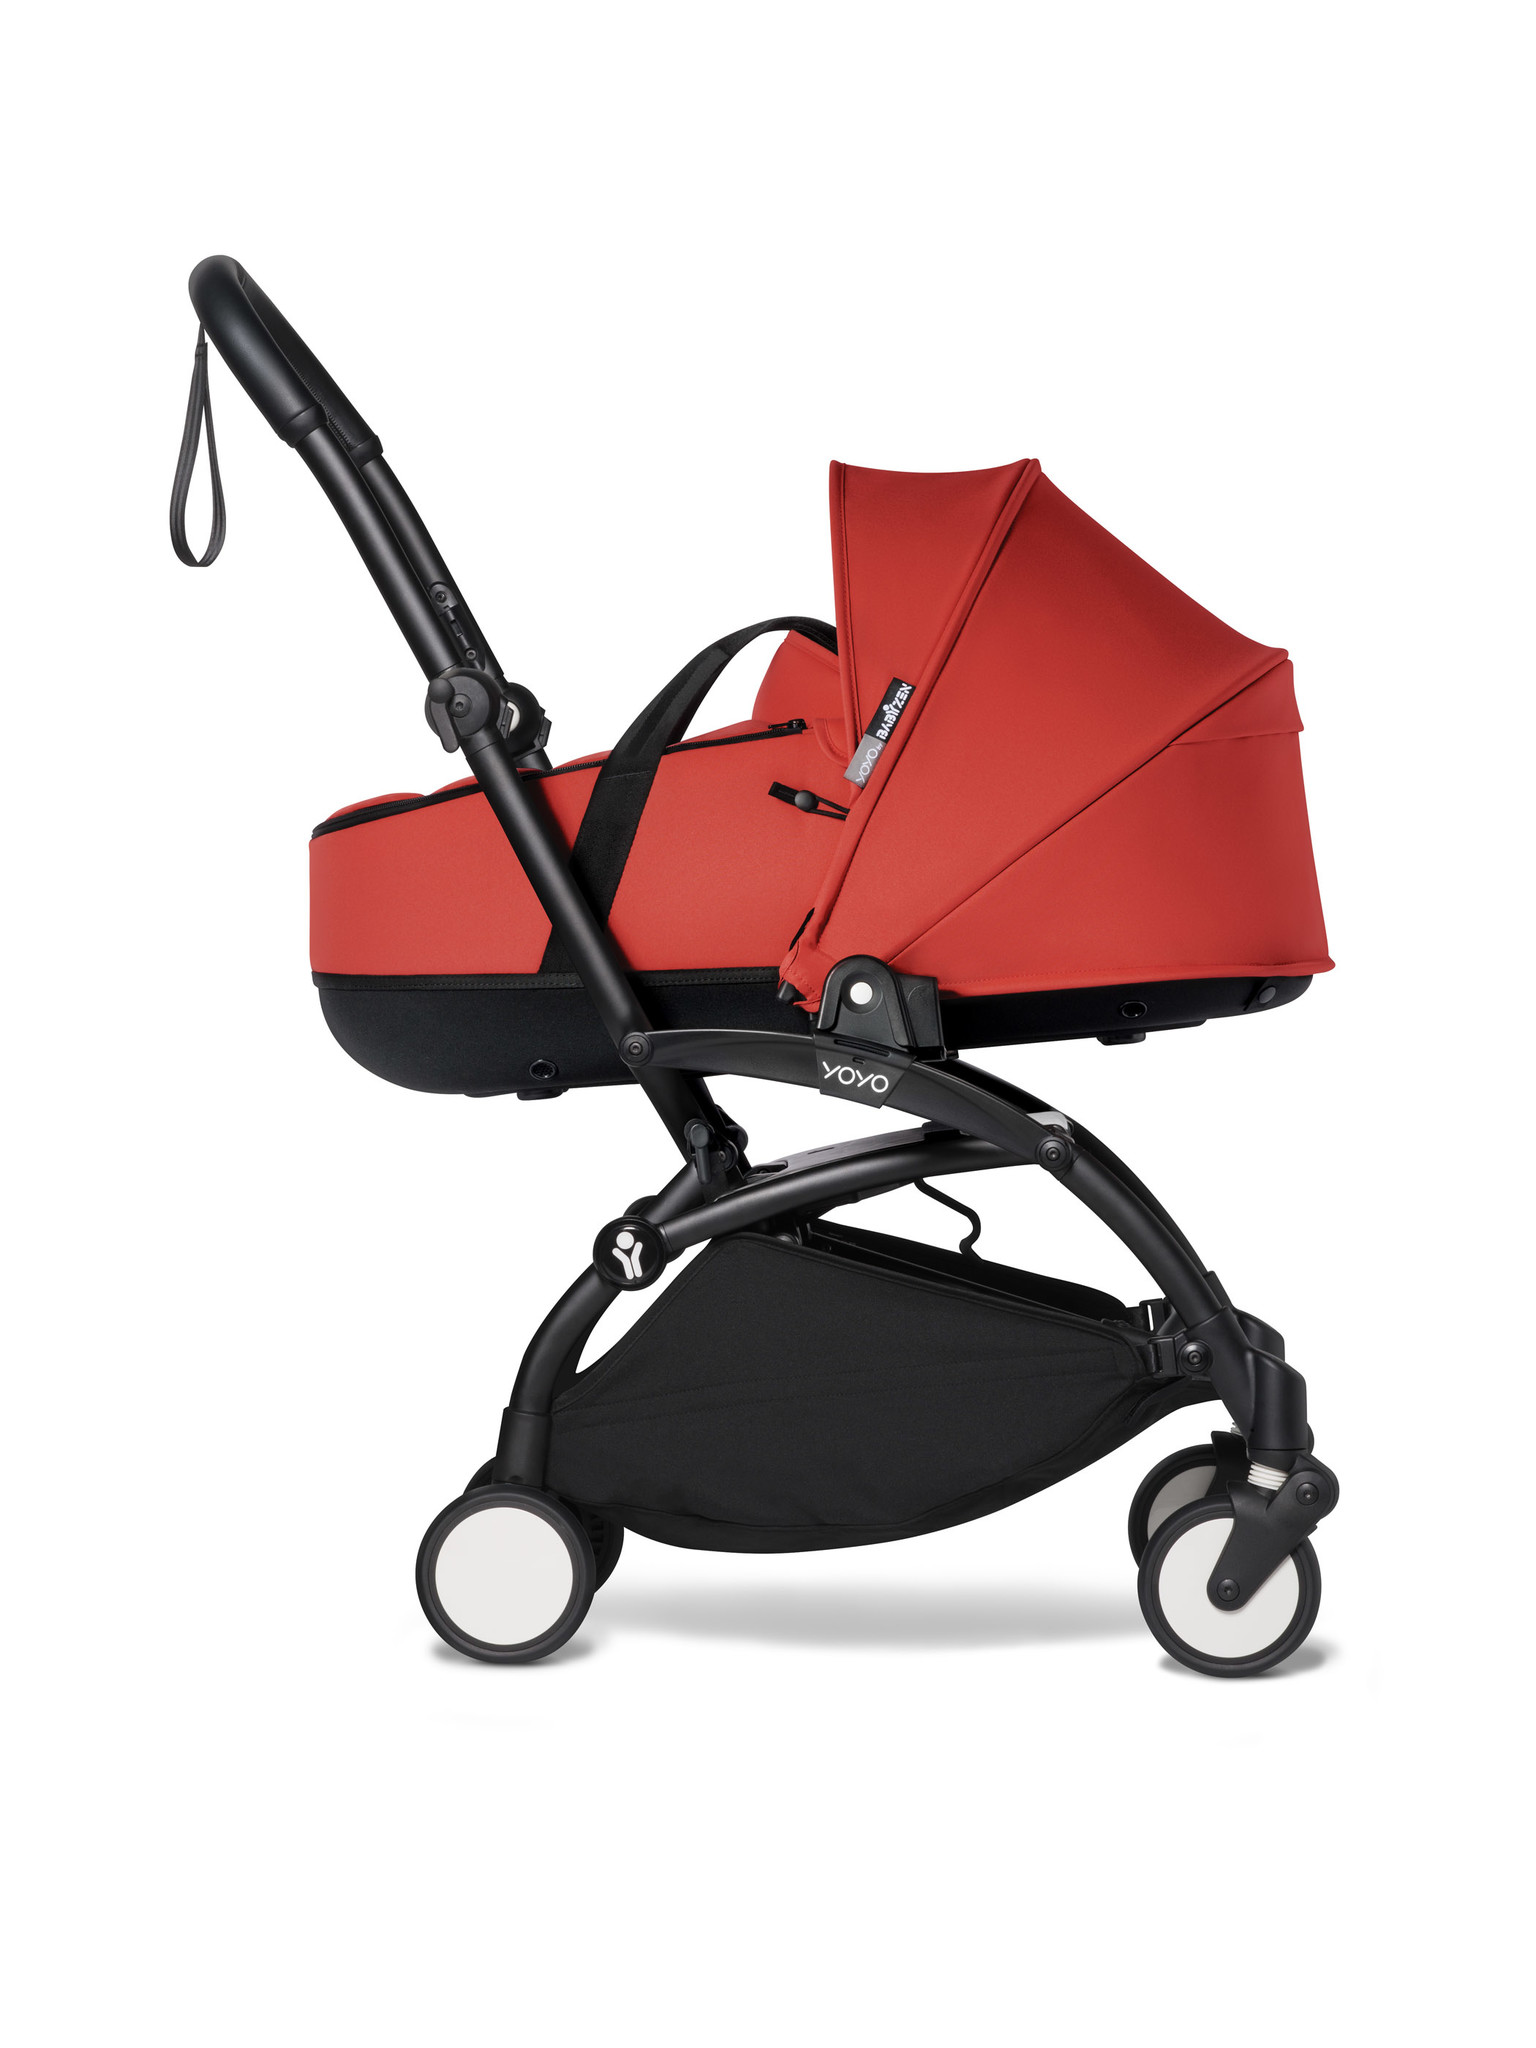 Babyzen Babyzen YOYO² schwarzer Rahmen mit YOYO Stubenwagen - Tragetasche - Rot